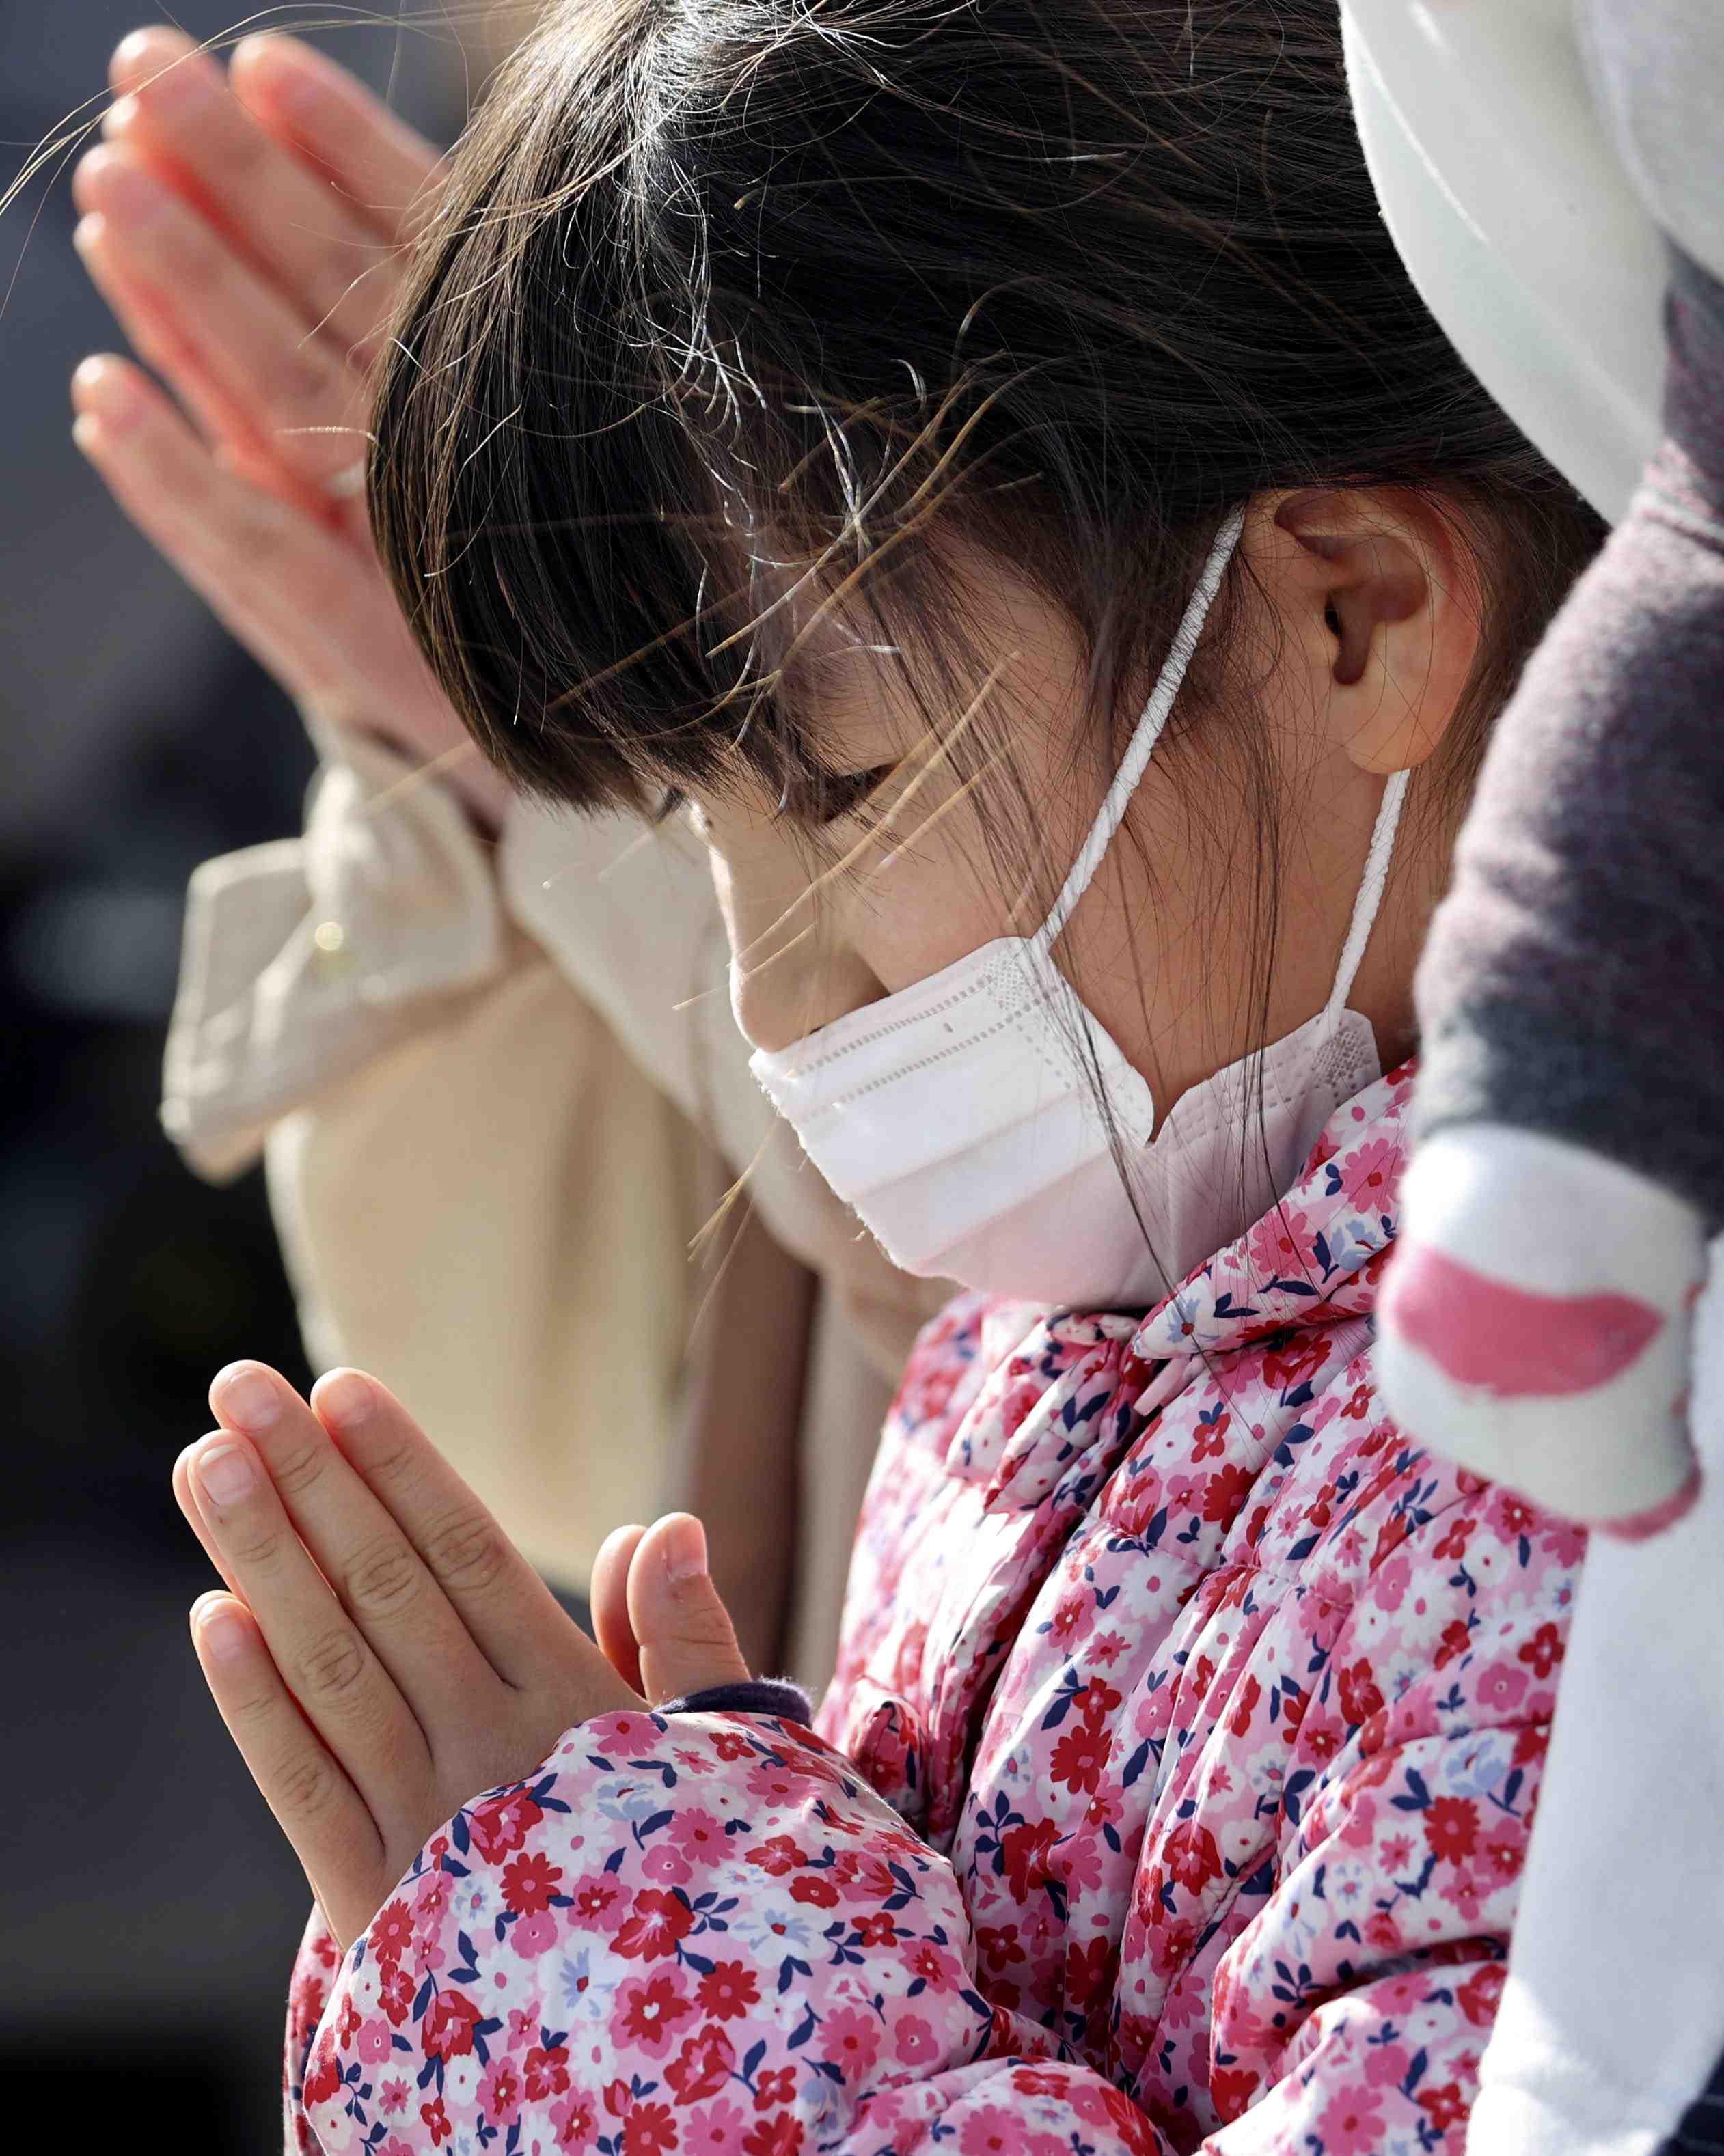 Japan 3.11 Anniversary The Great Tohoku Earthquake 050